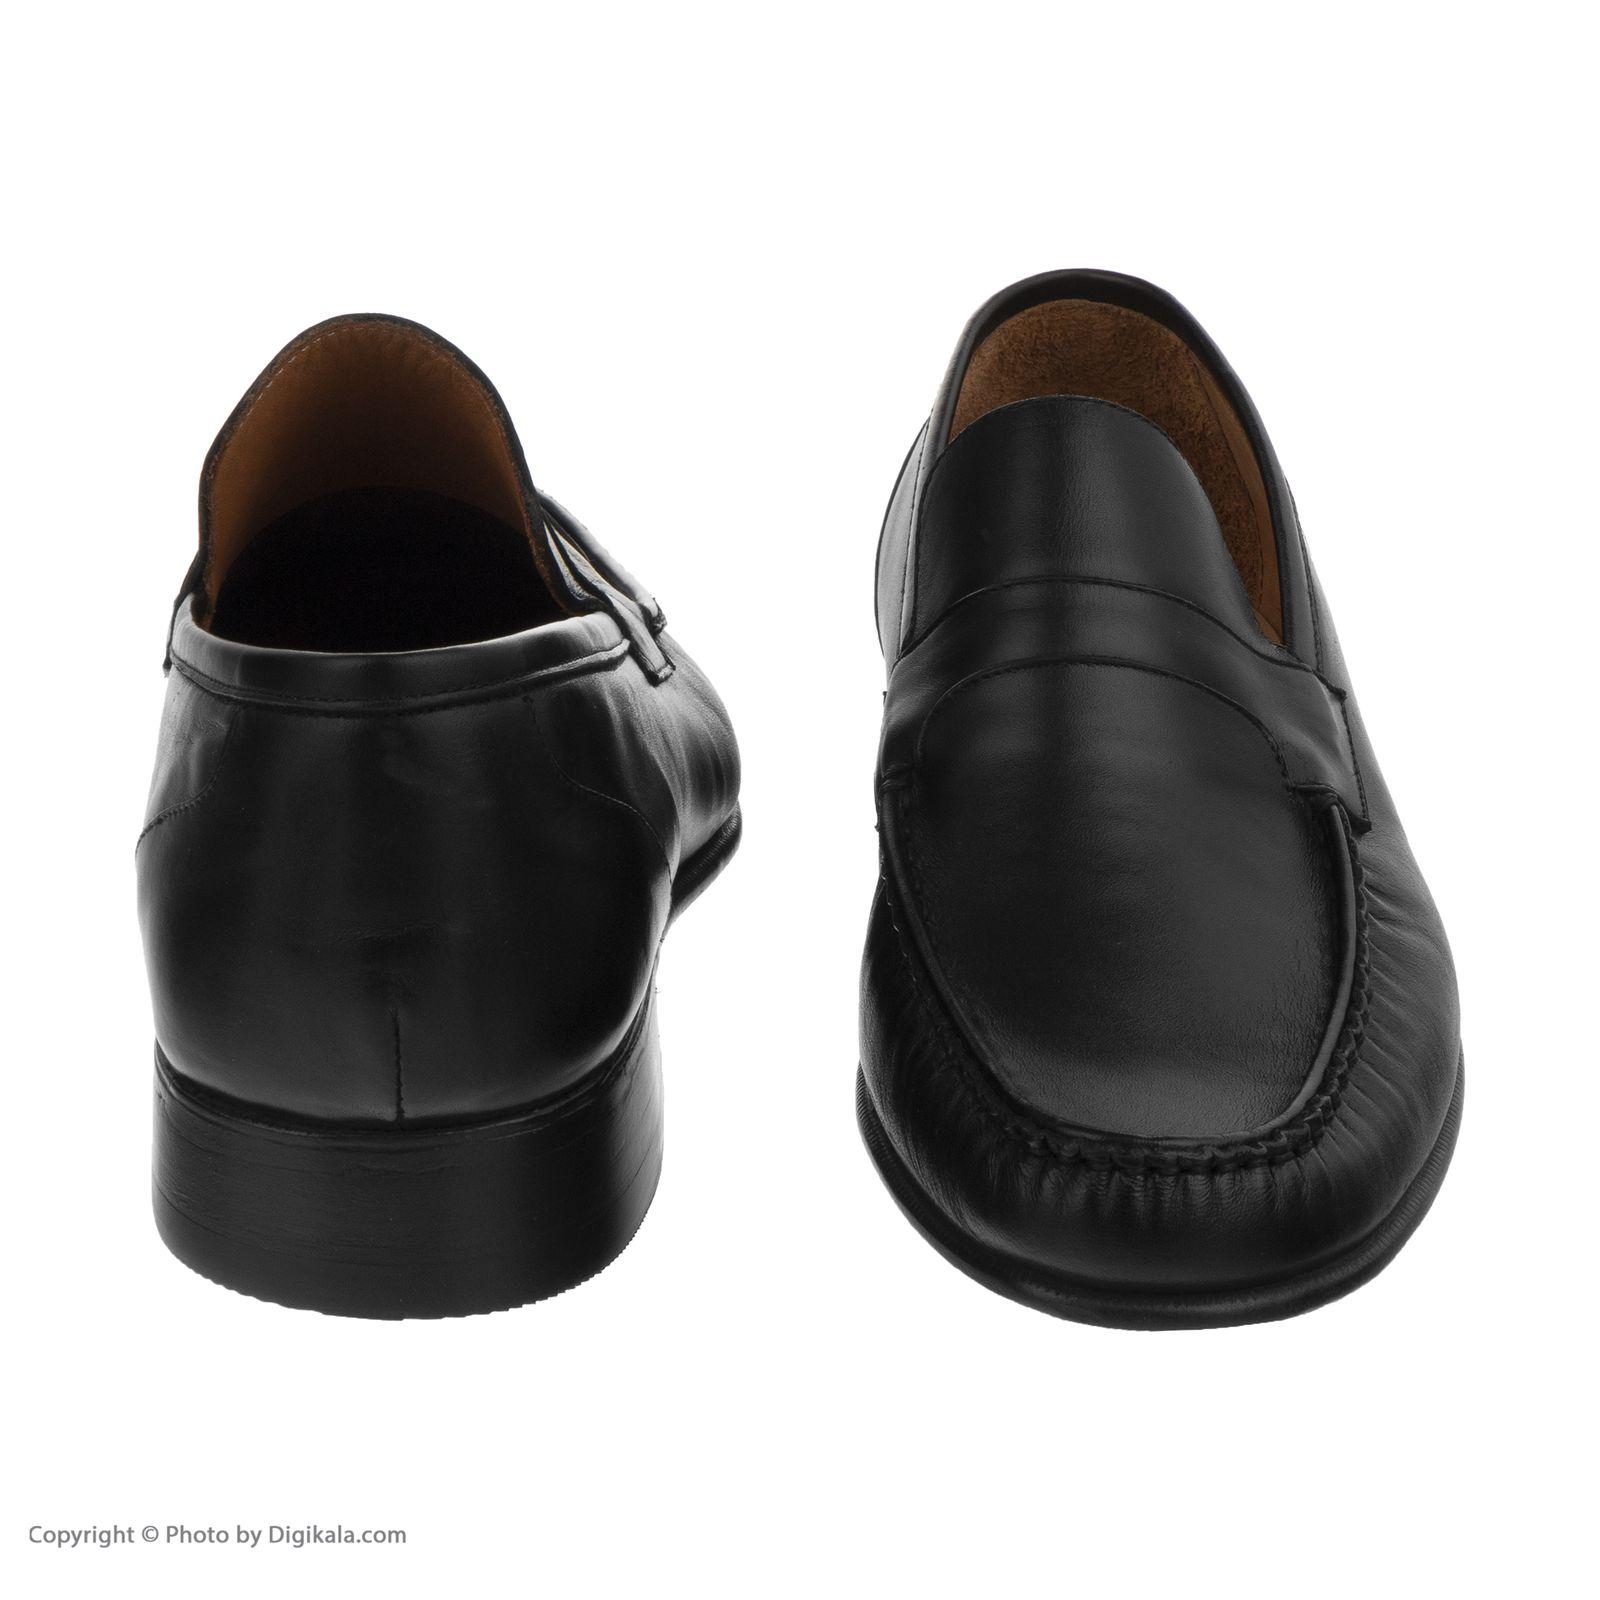 کفش مردانه نظری کد 409 -  - 2